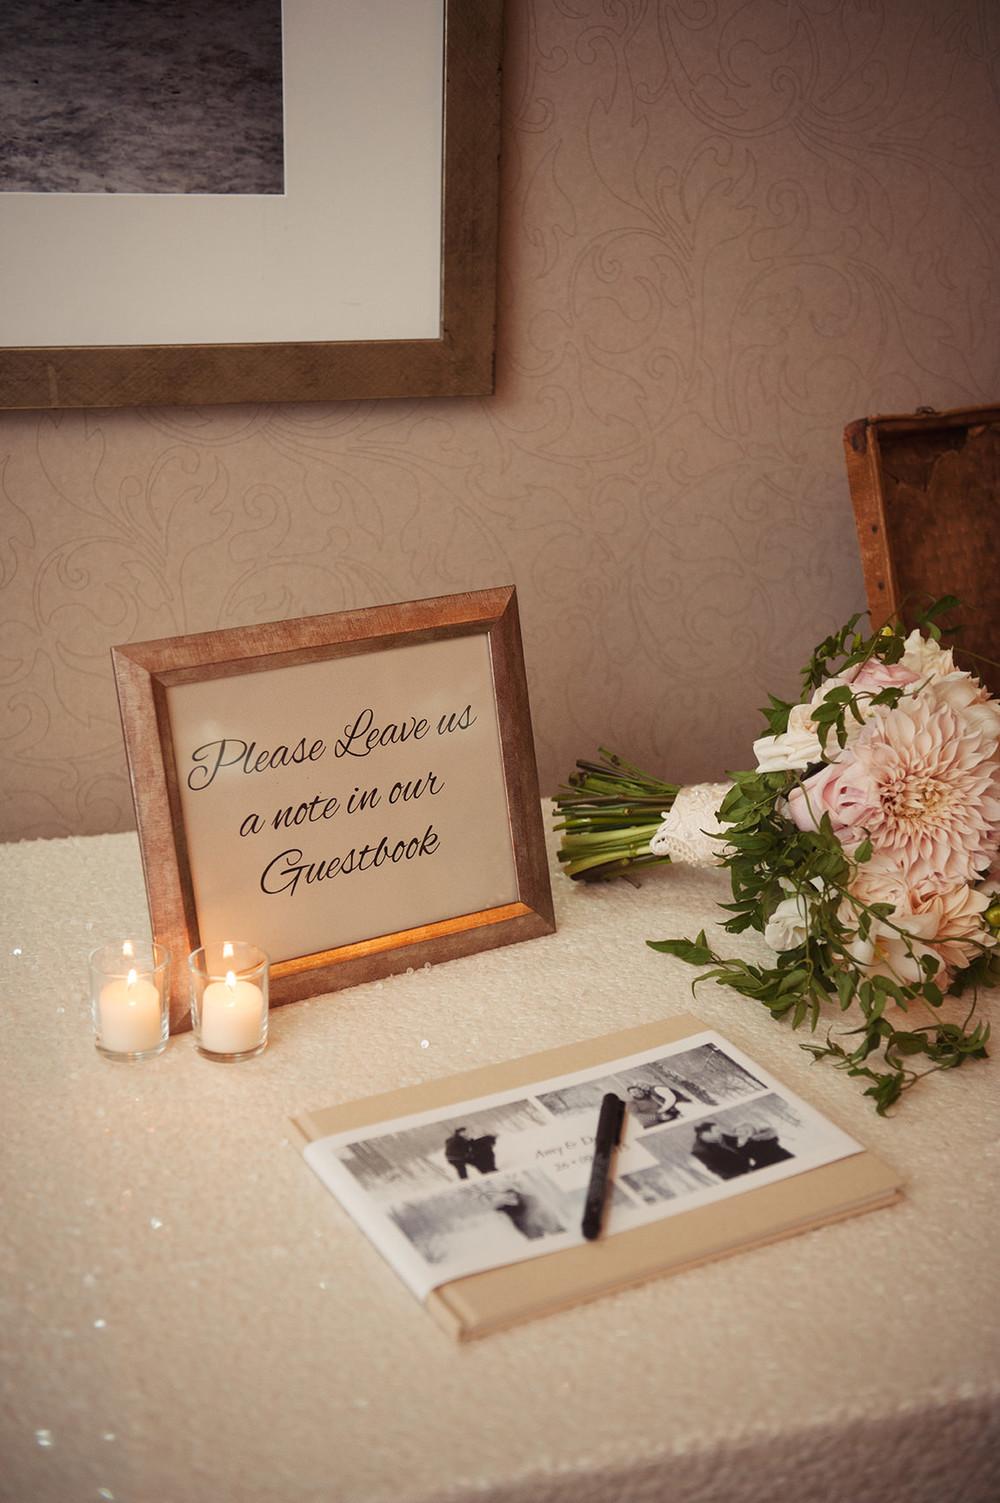 St-Catharines-Wedding-Stone-Mill-Inn-Amy-Darryl-photography-by-Morgan-Falk-097.JPG